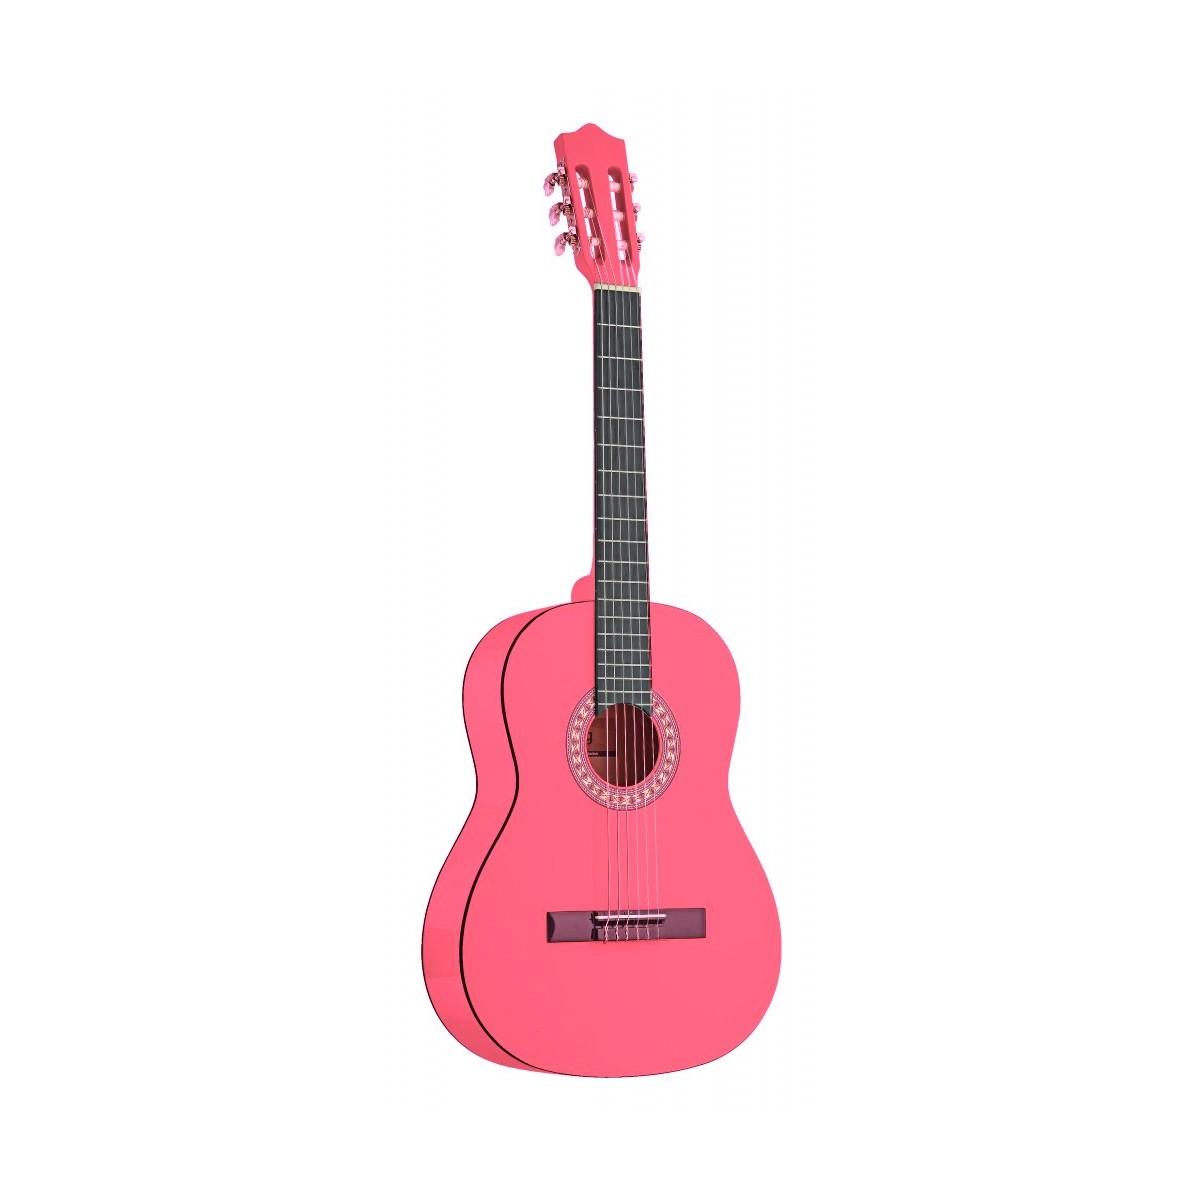 guitare classique enfant guitare 1 4 rose stagg. Black Bedroom Furniture Sets. Home Design Ideas